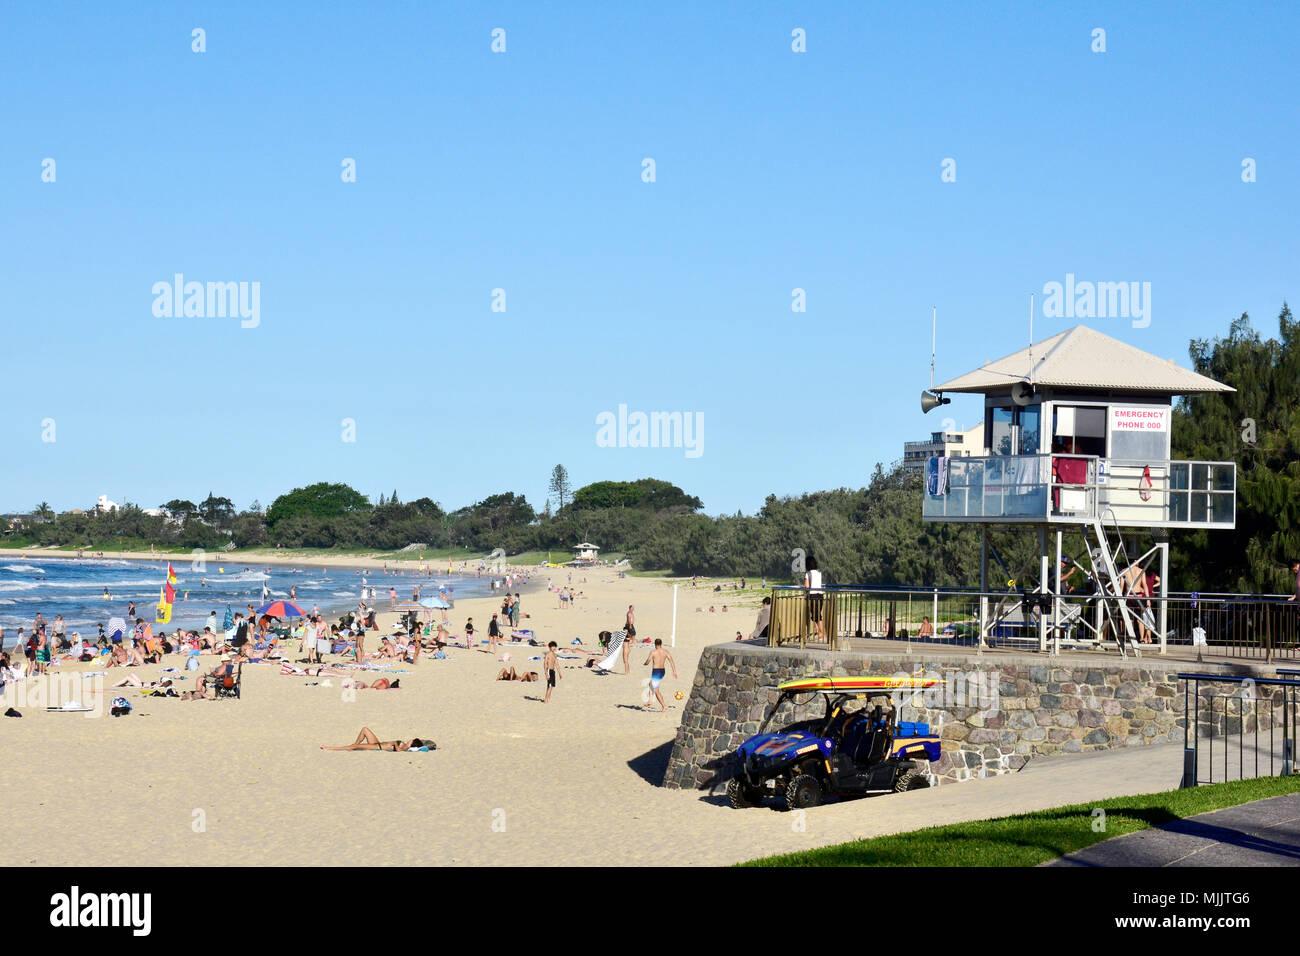 CROWDS OF PEOPLE ENJOYING BEAUTIFUL MOOLOOLABA BEACH IN QUEENSLAND AUSTRALIA - Stock Image